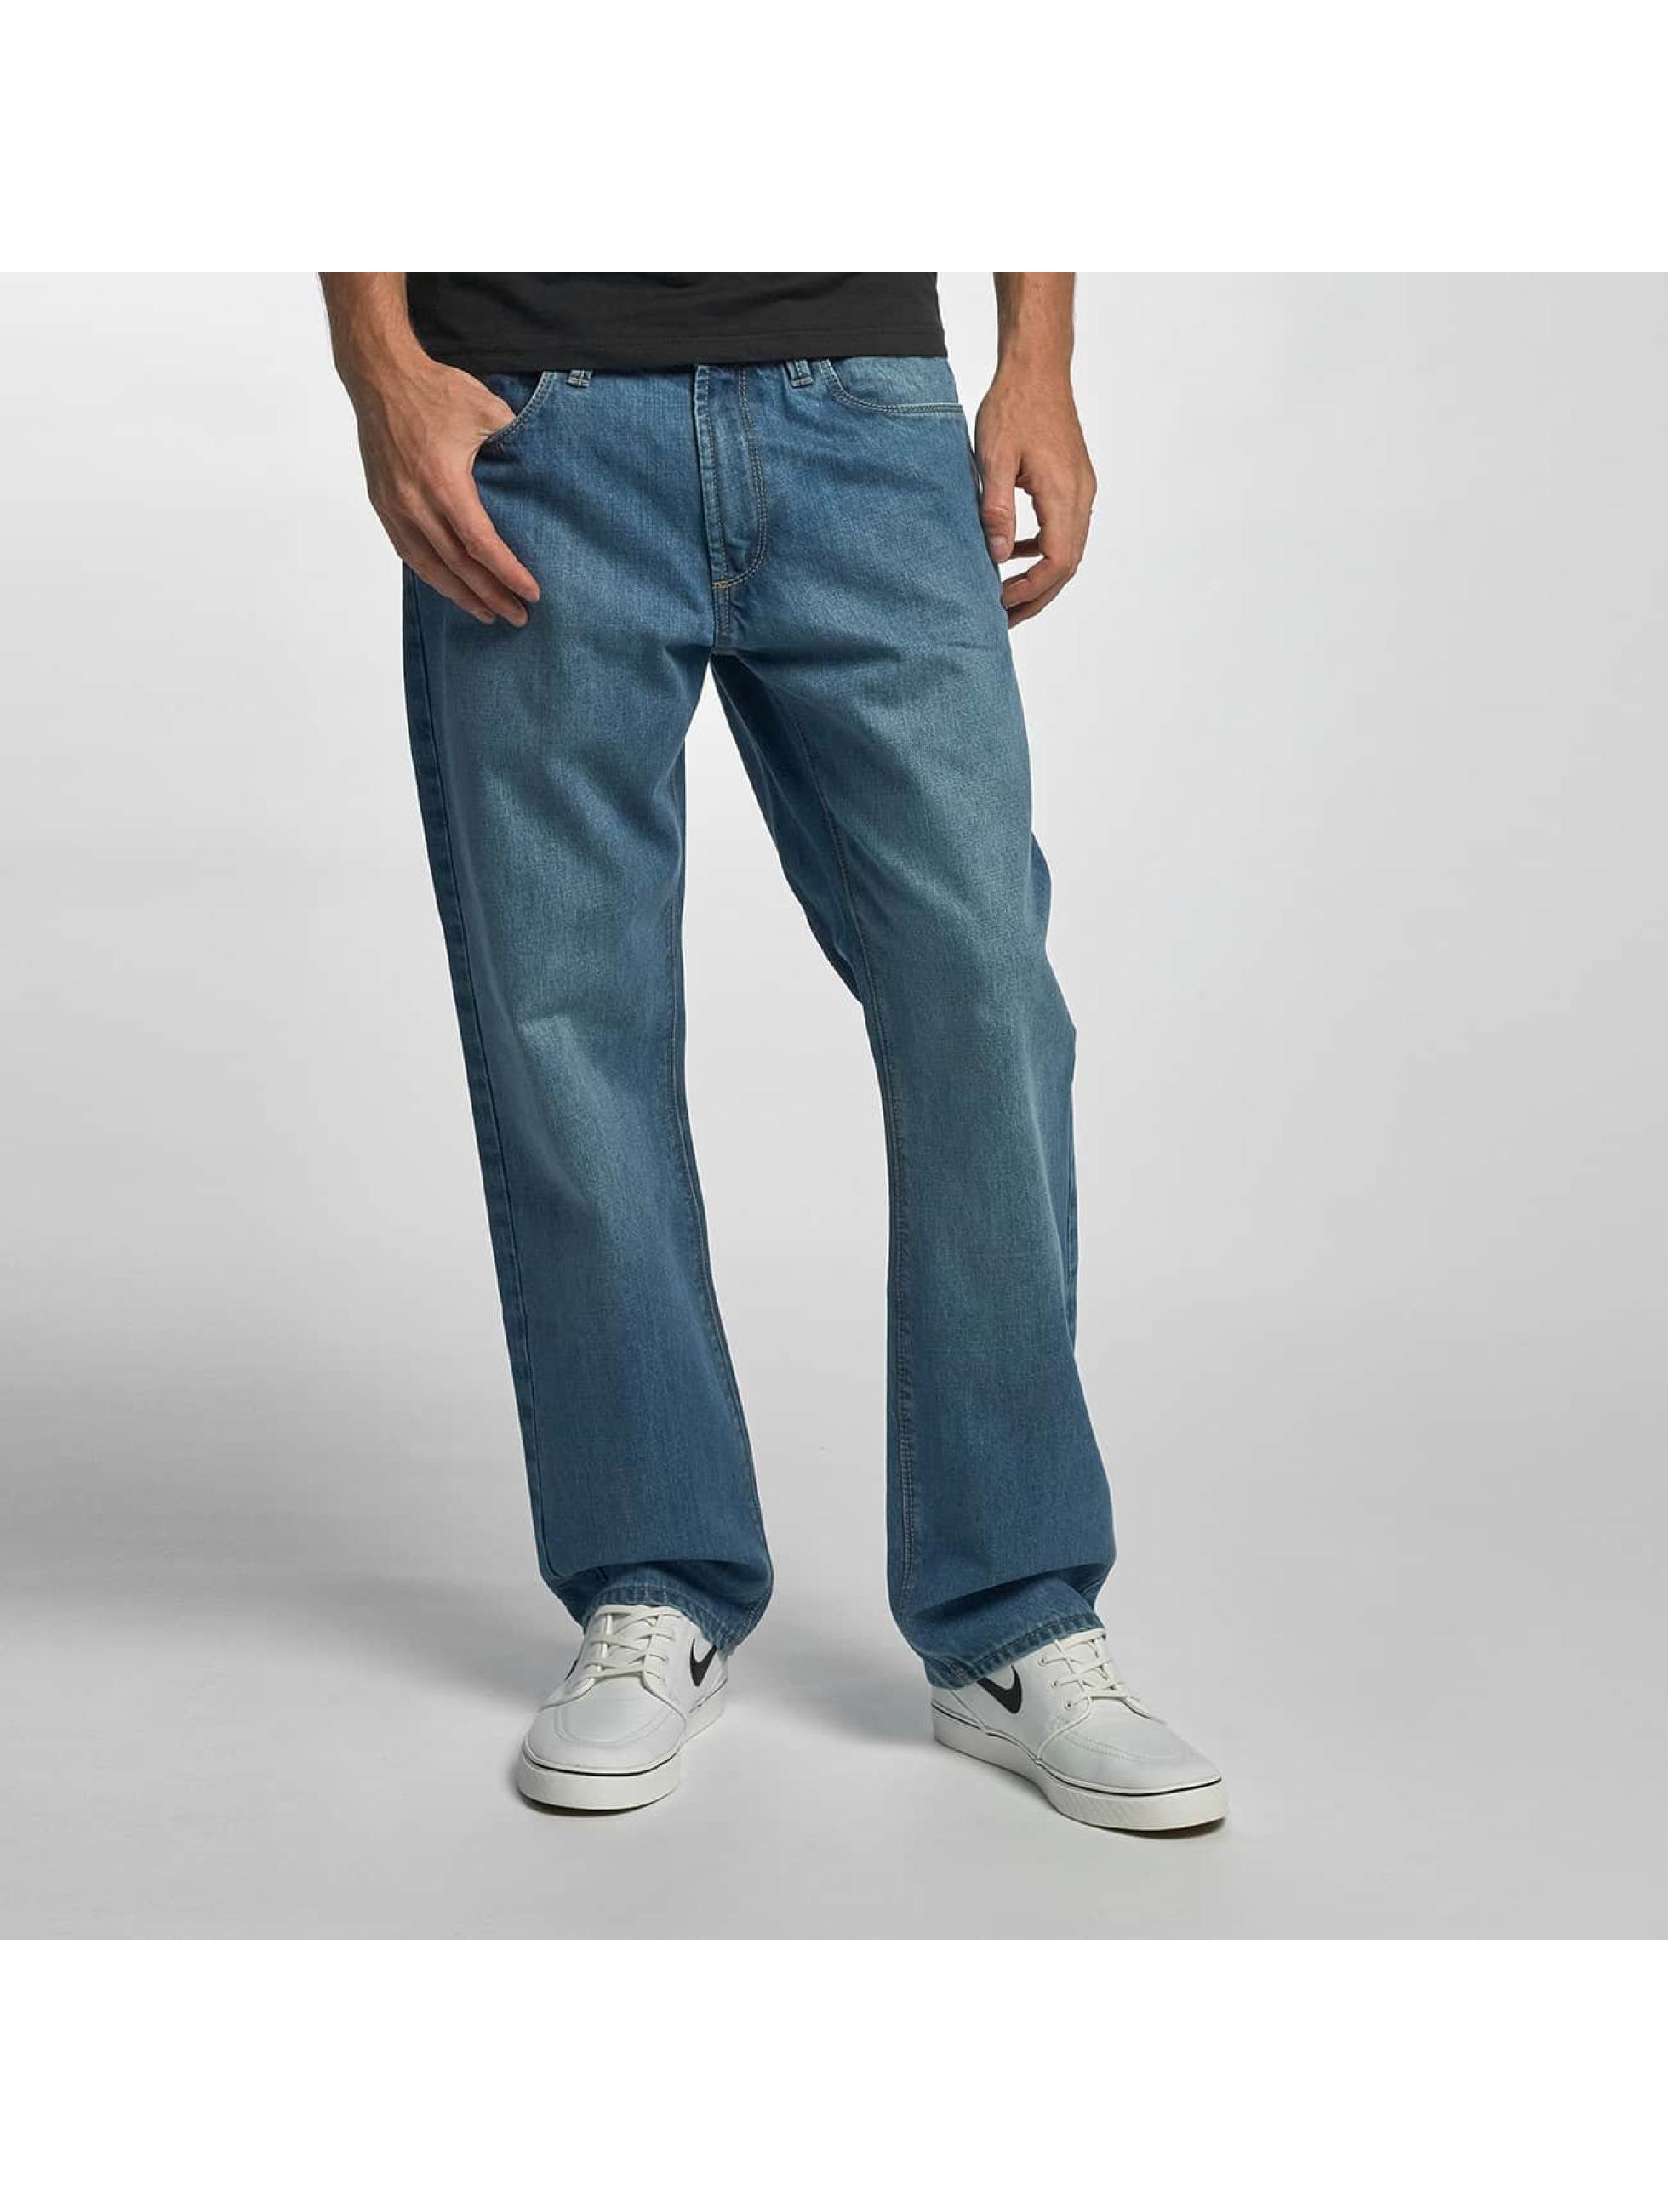 Reell Jeans Männer Baggy Drifter Baggy in blau